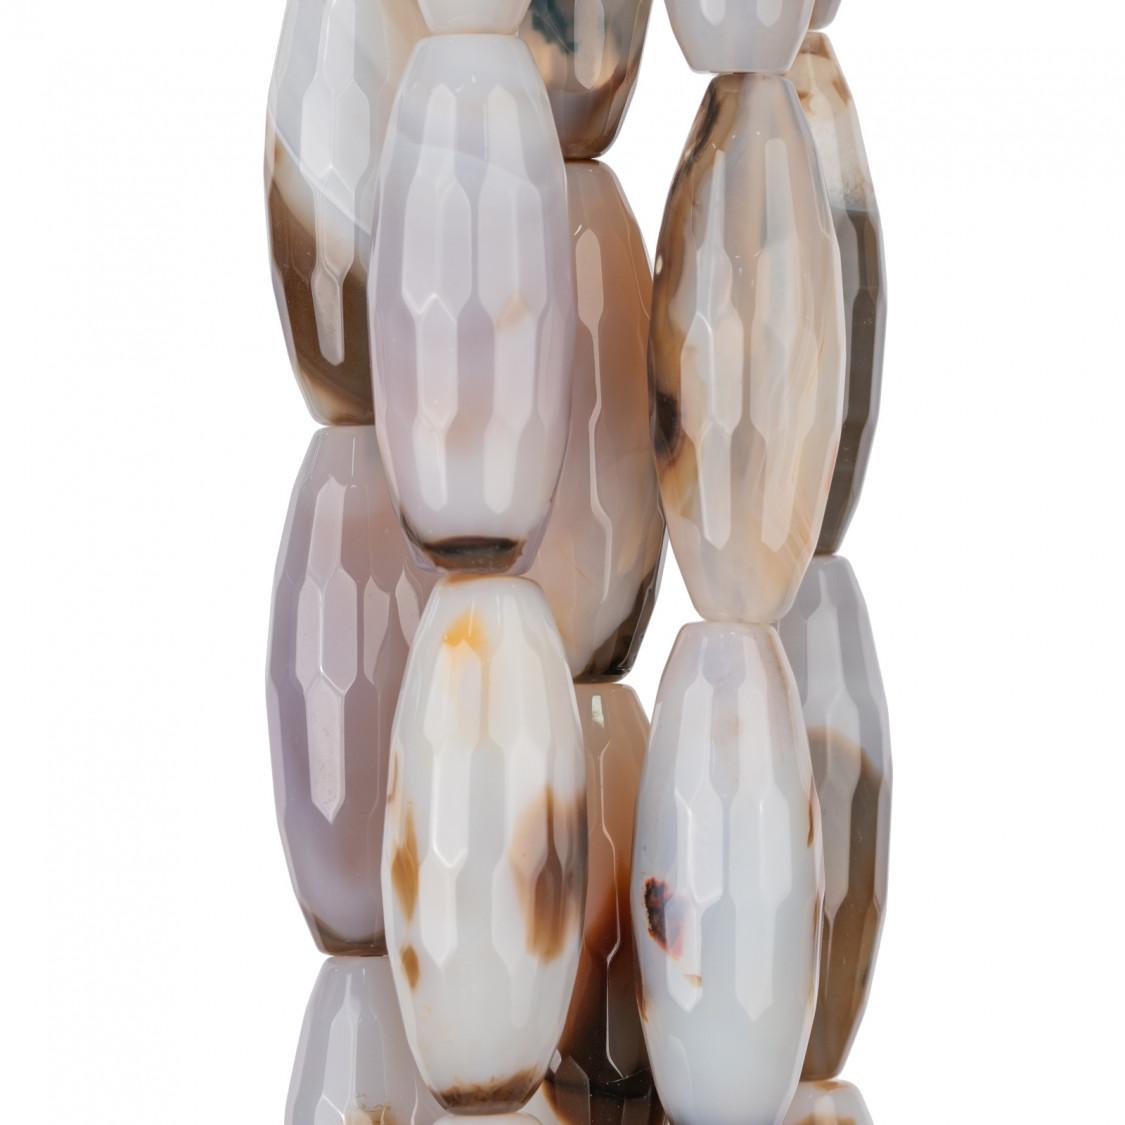 Perle Di Fiume Bottoni Cabochon 1 Foro (AA) 11.0-11.5mm 6 Paia Bianco